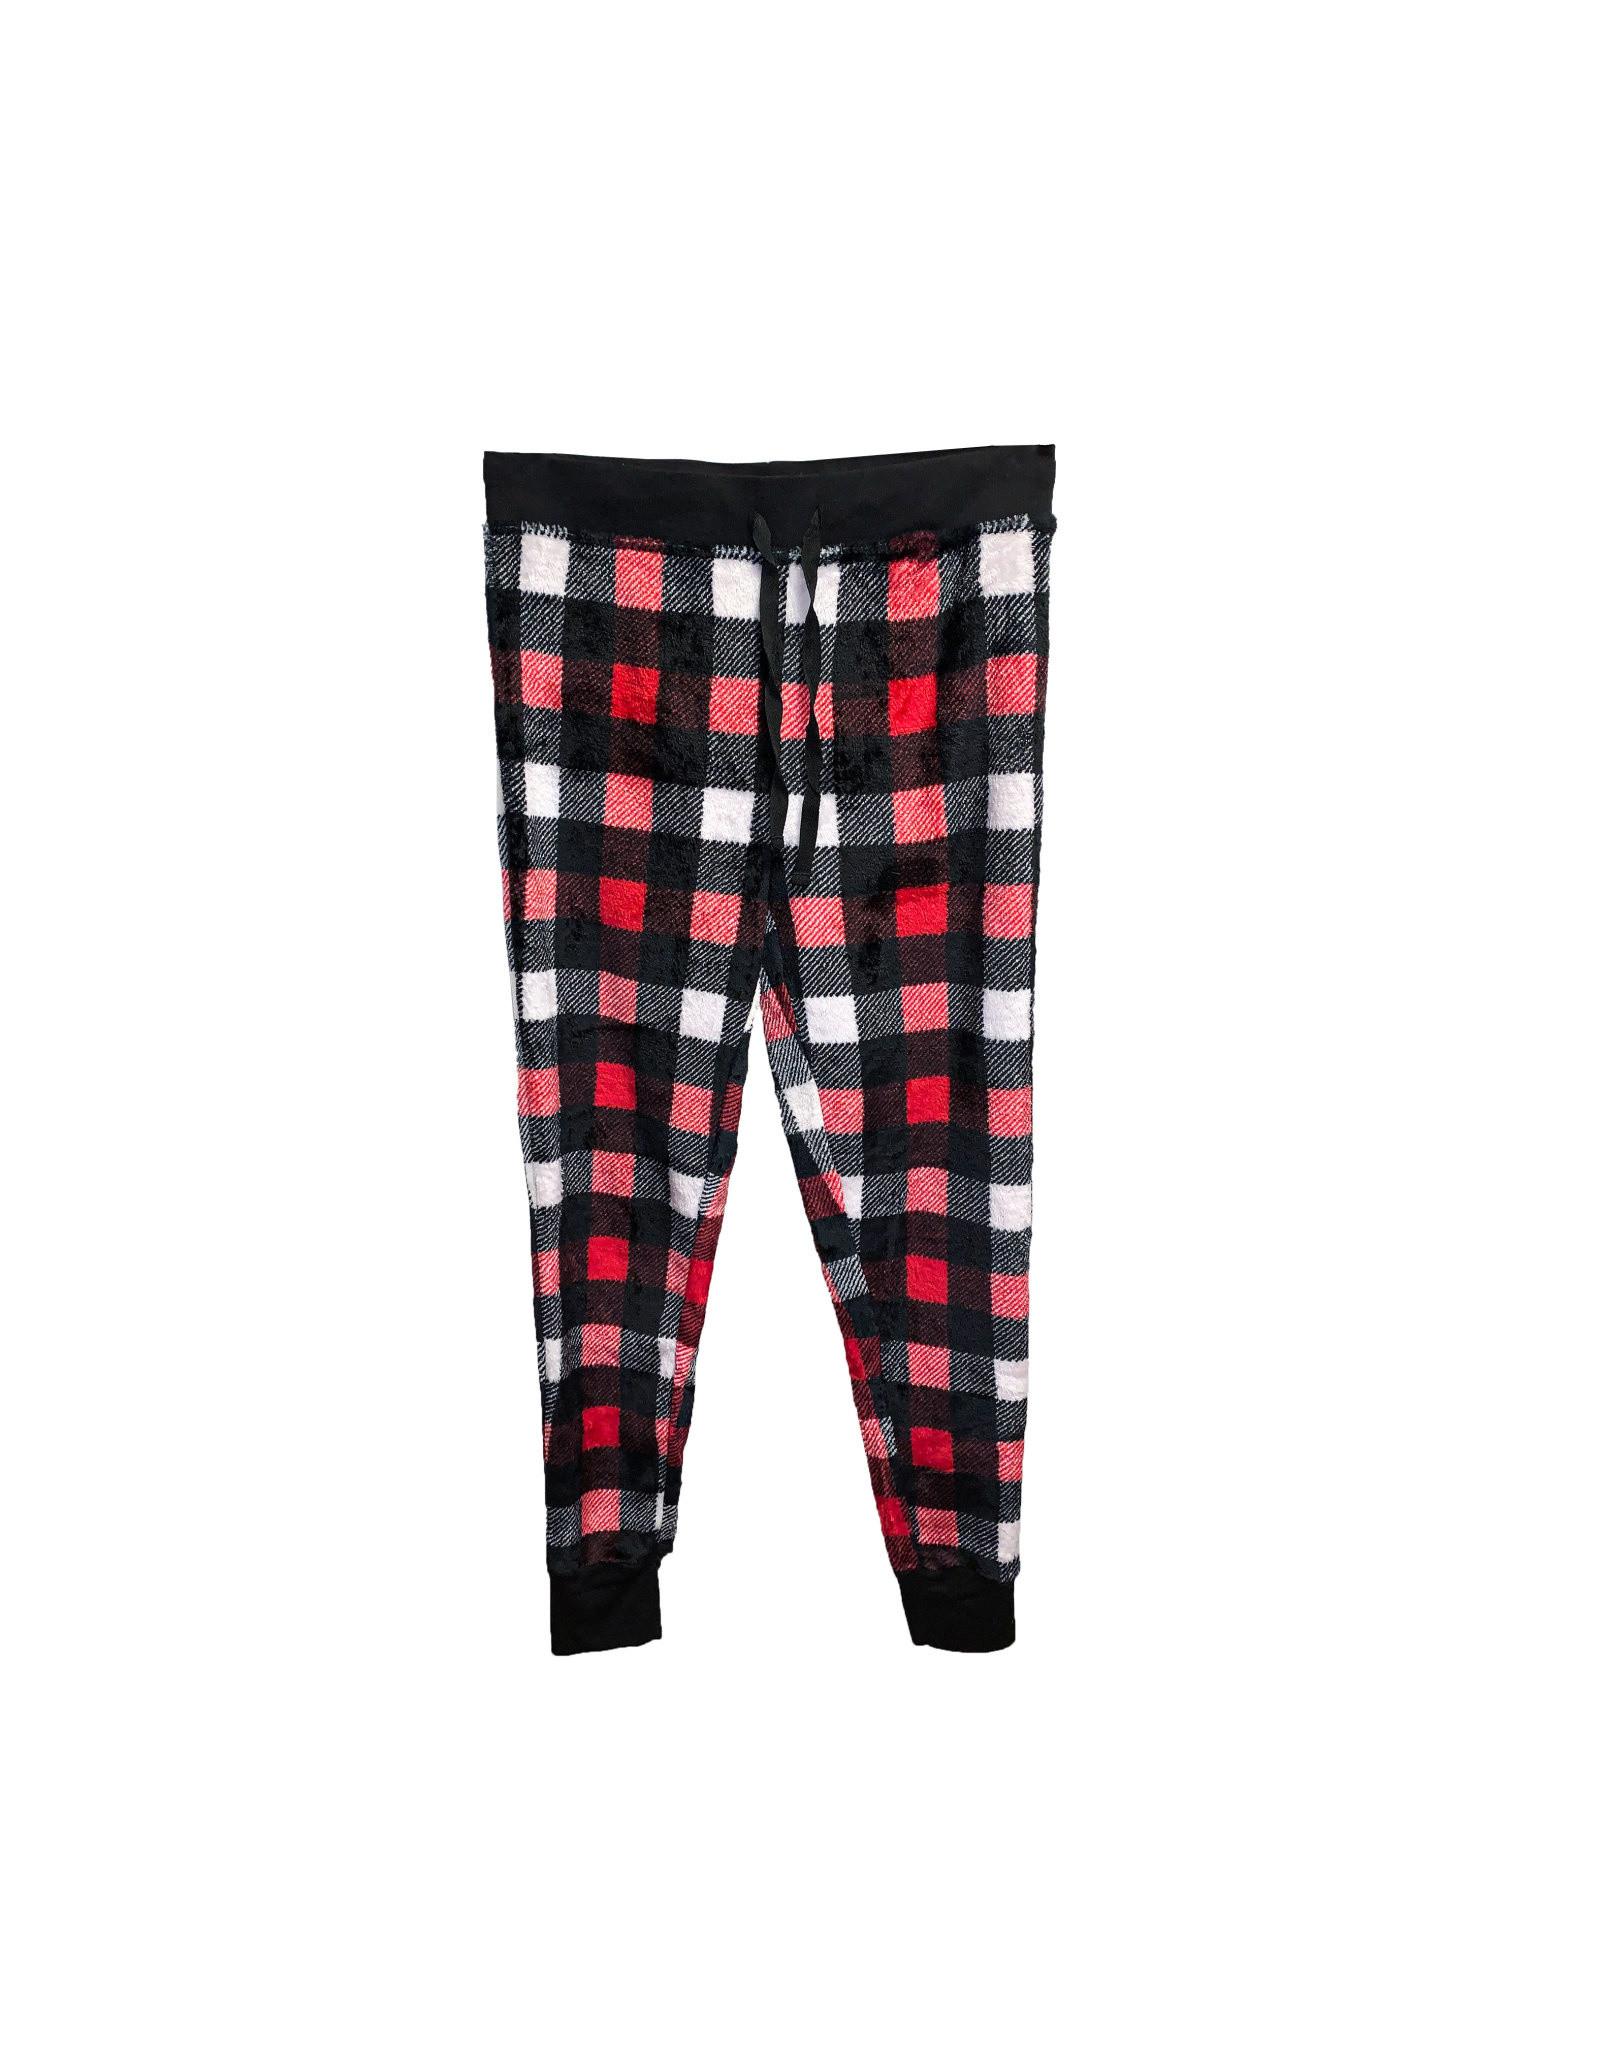 Sleep Nation Sleep Nation Girls Pants  Pyjamas Size M